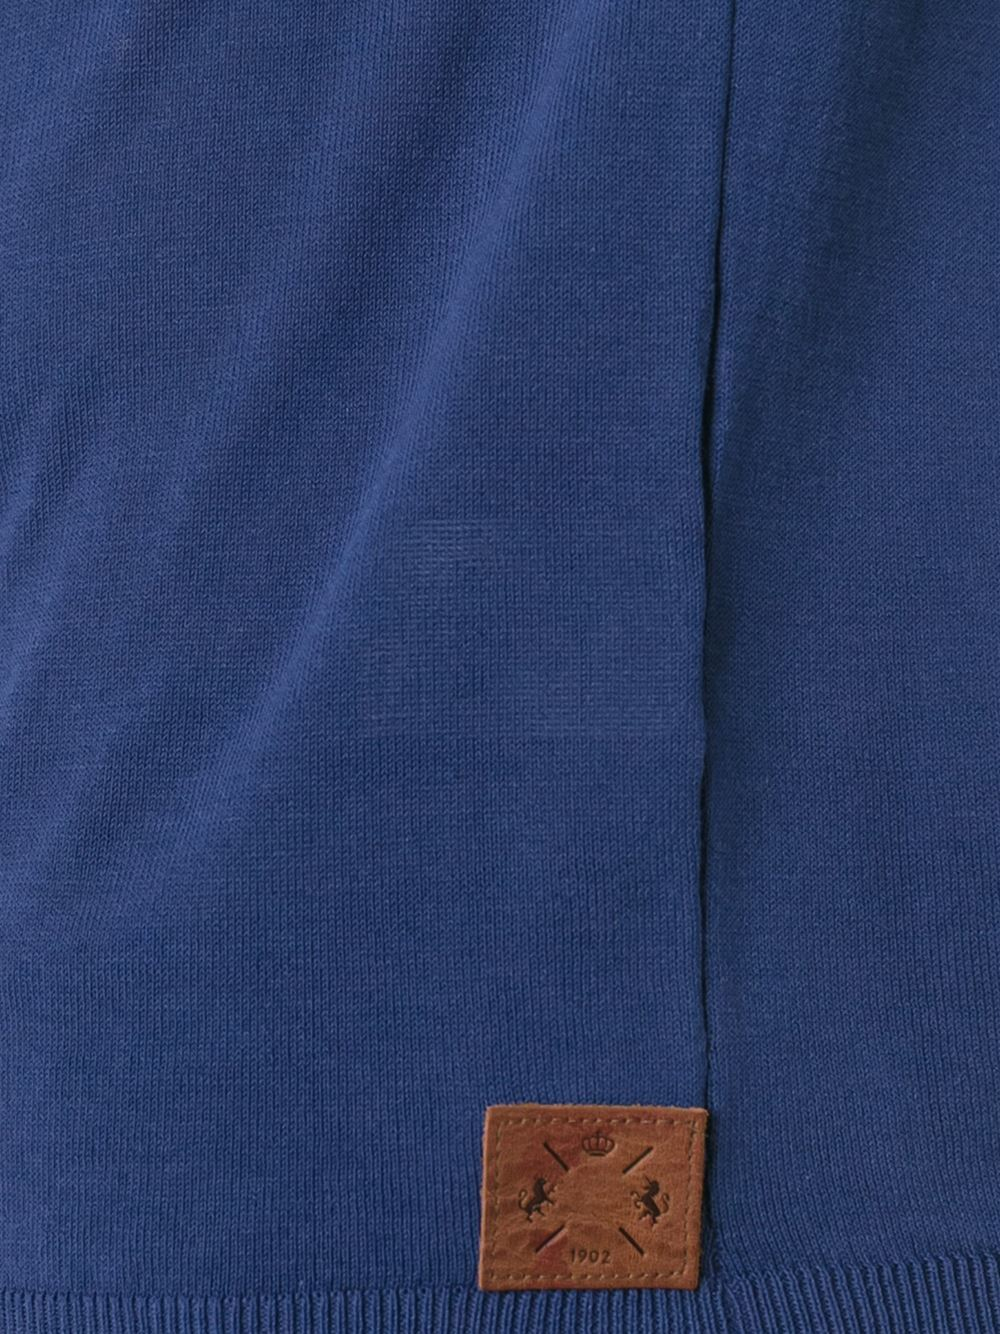 Al Duca d'Aosta Cotton Knit Polo Shirt in Blue for Men